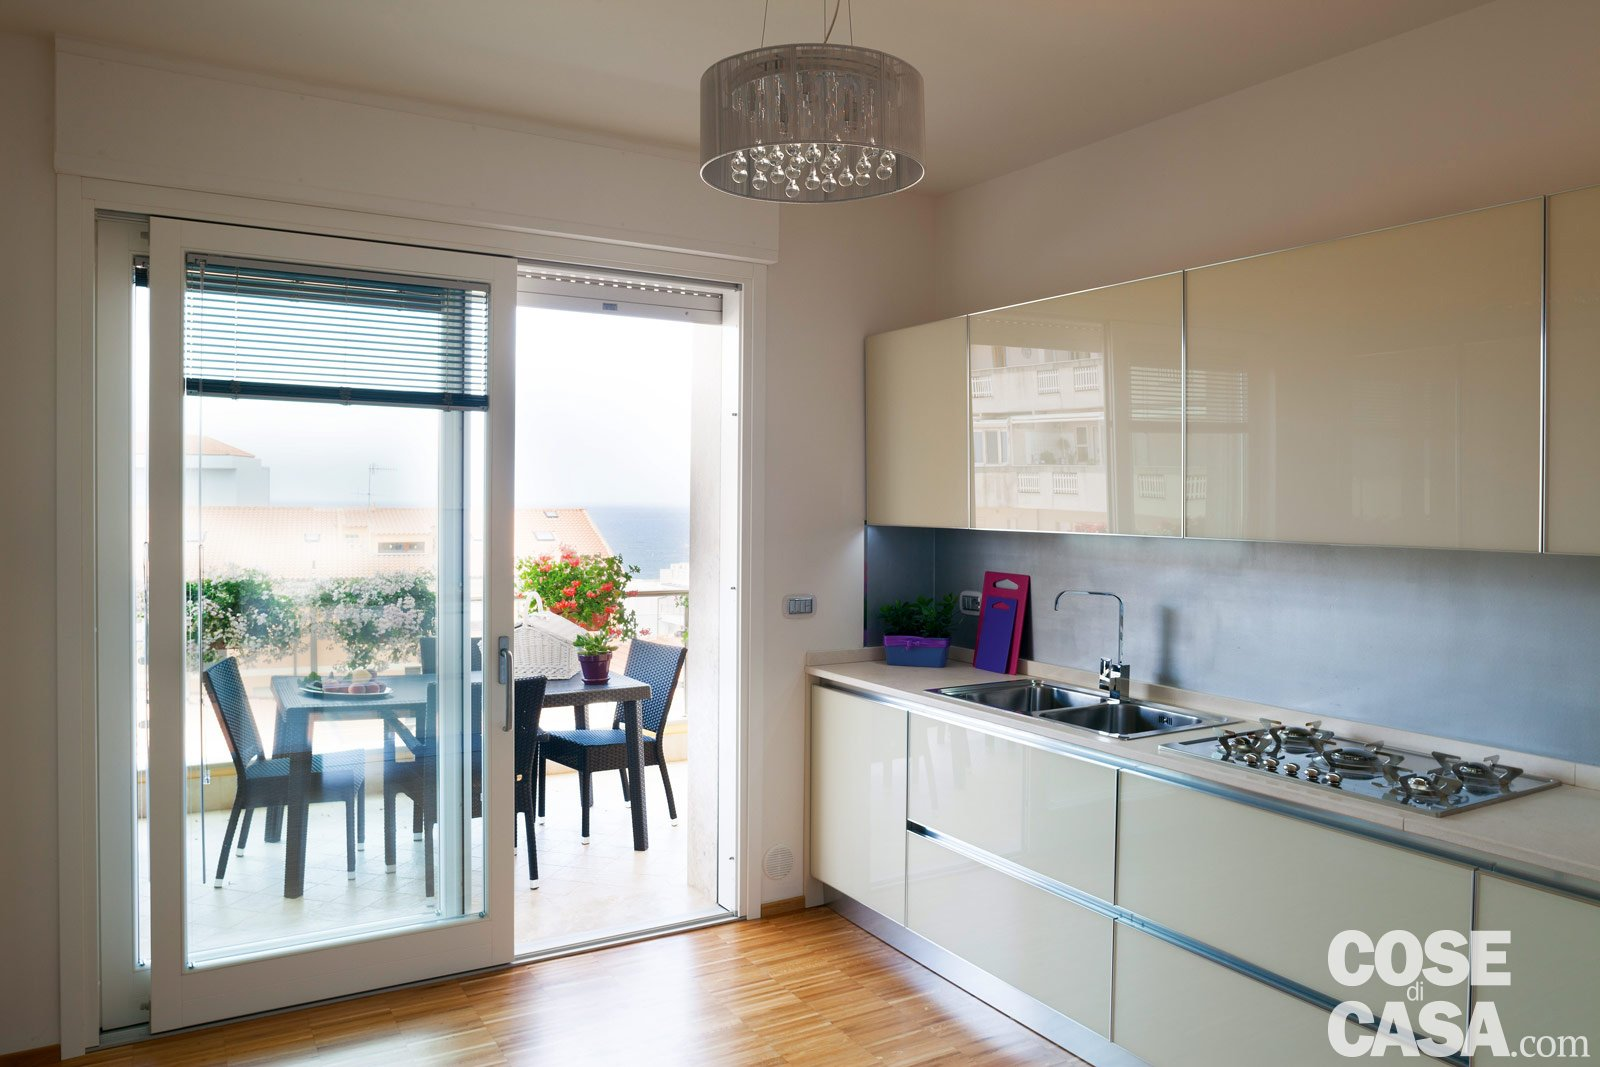 Una casa da due appartamenti con vista mare cose di casa for Foto case arredate moderne